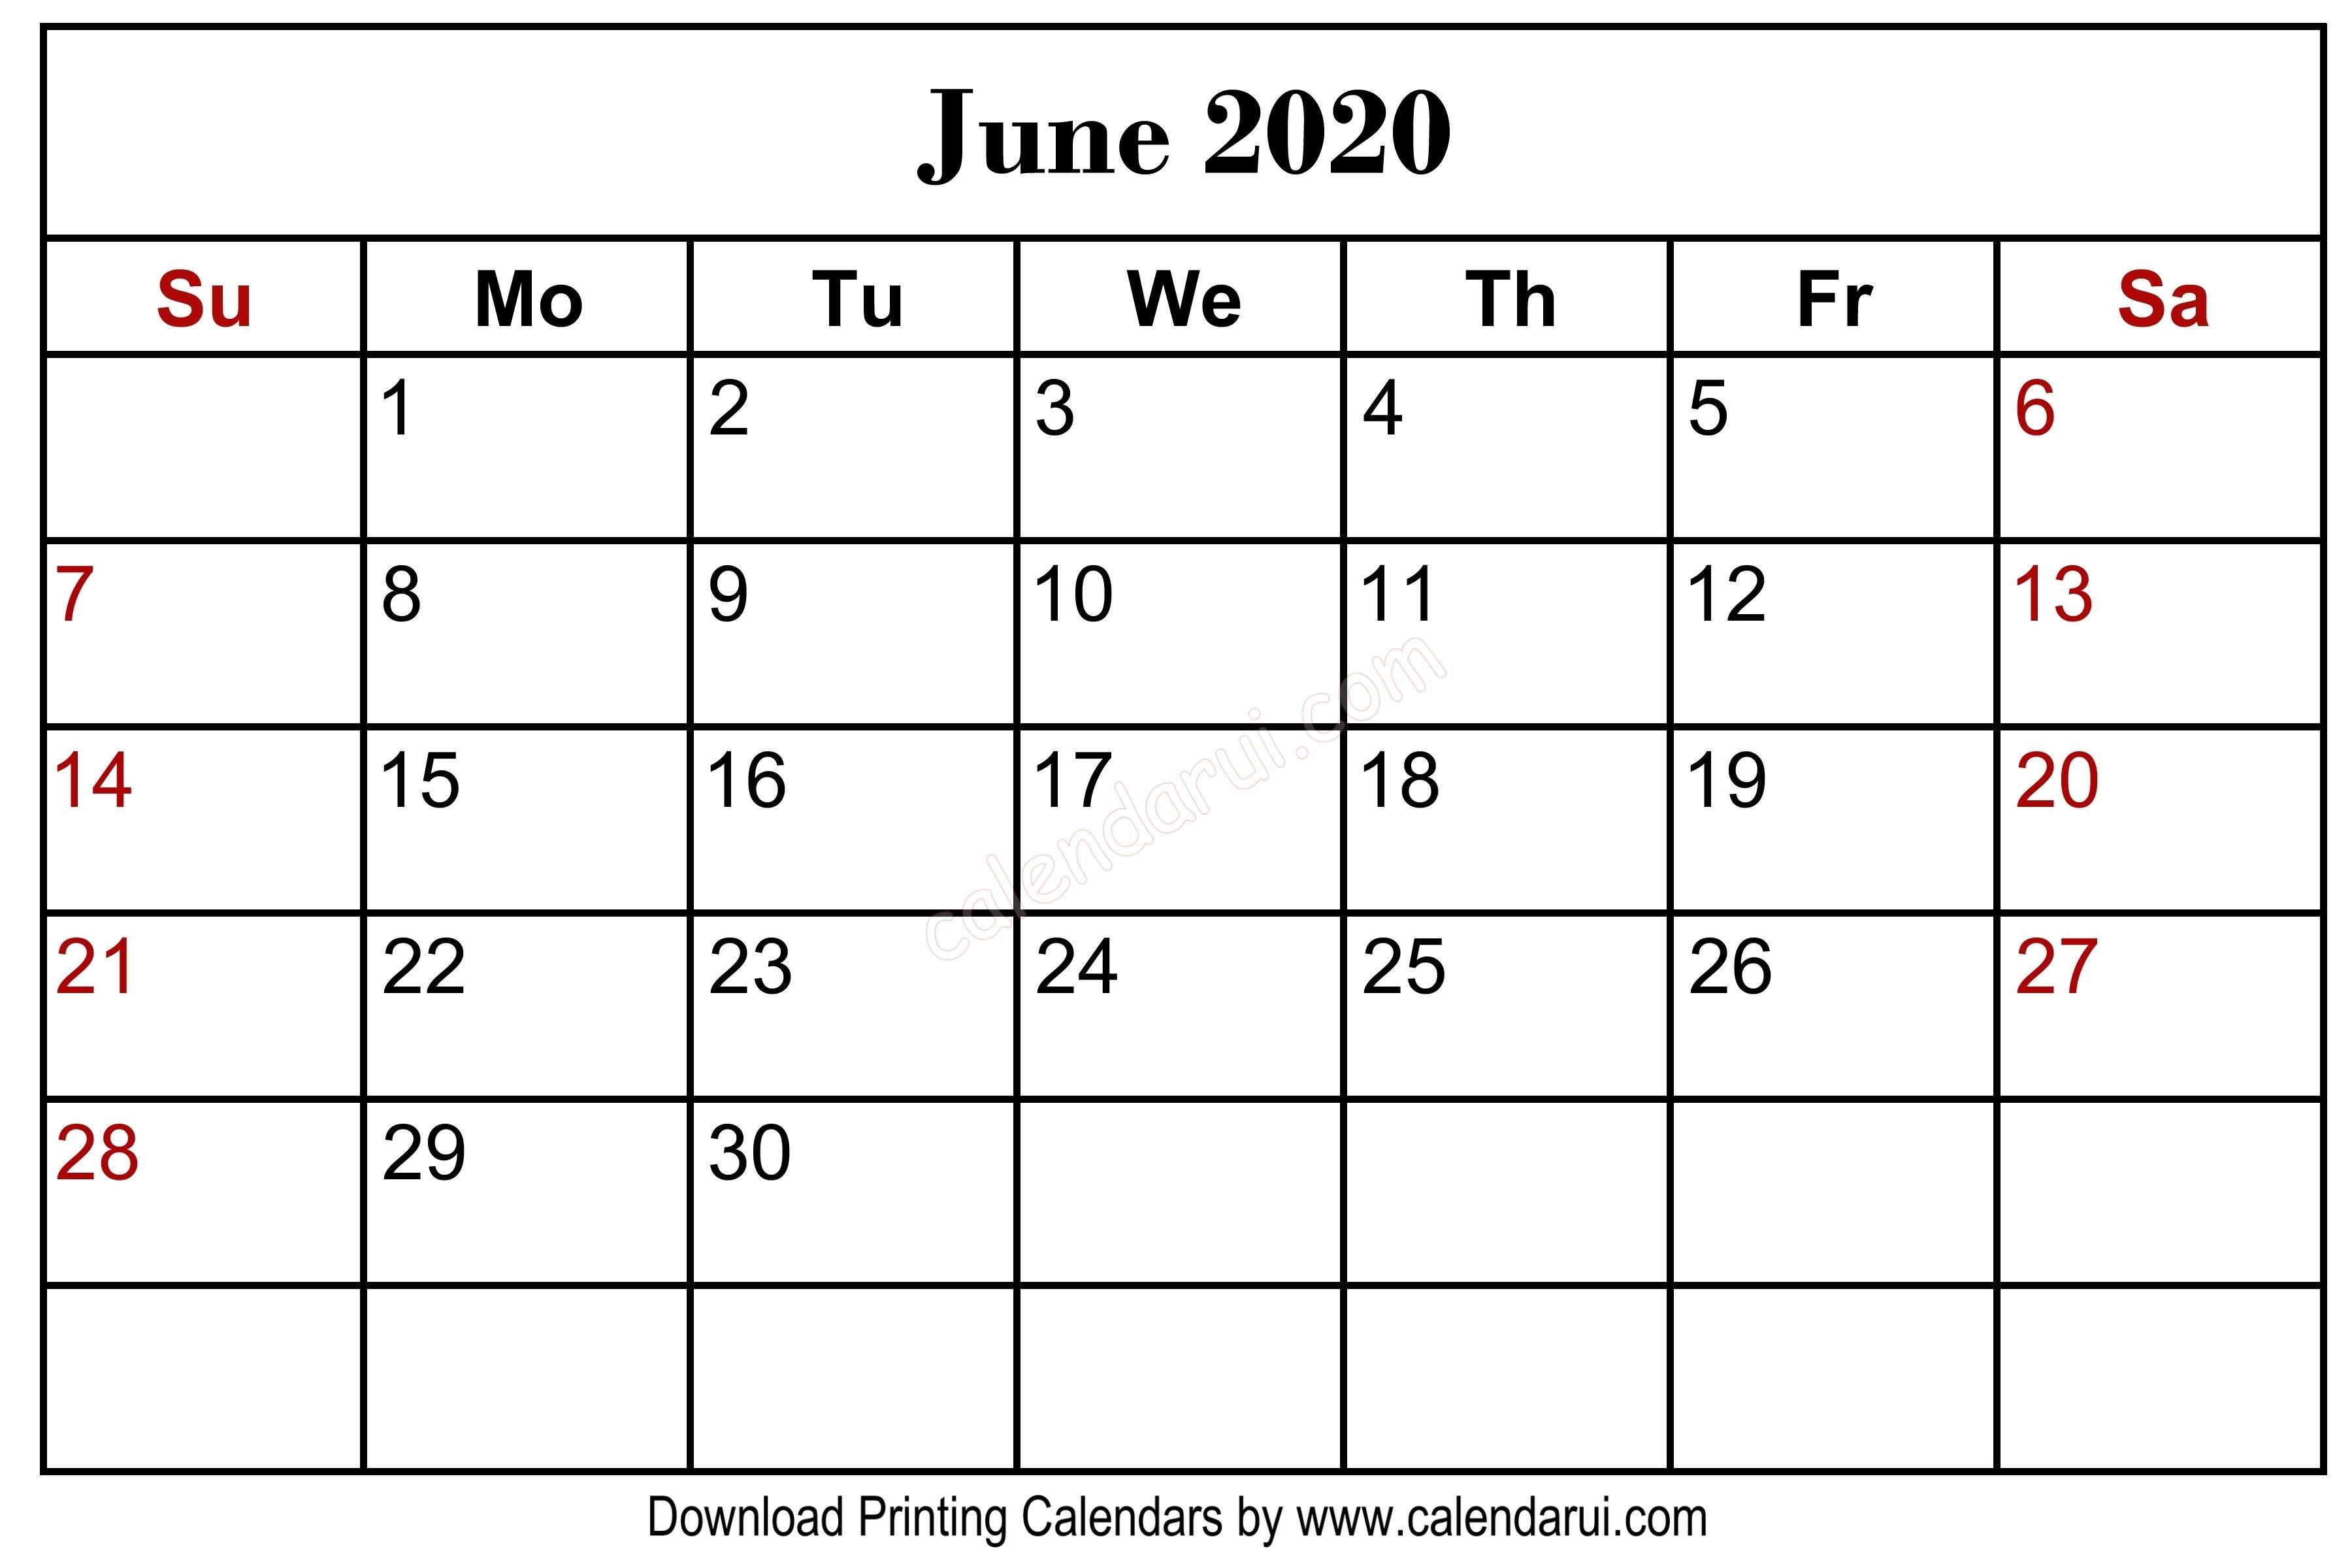 Homepage / 2020 Calendar / June 2020 Blank Calendar-January 2020 Calendar Hindu